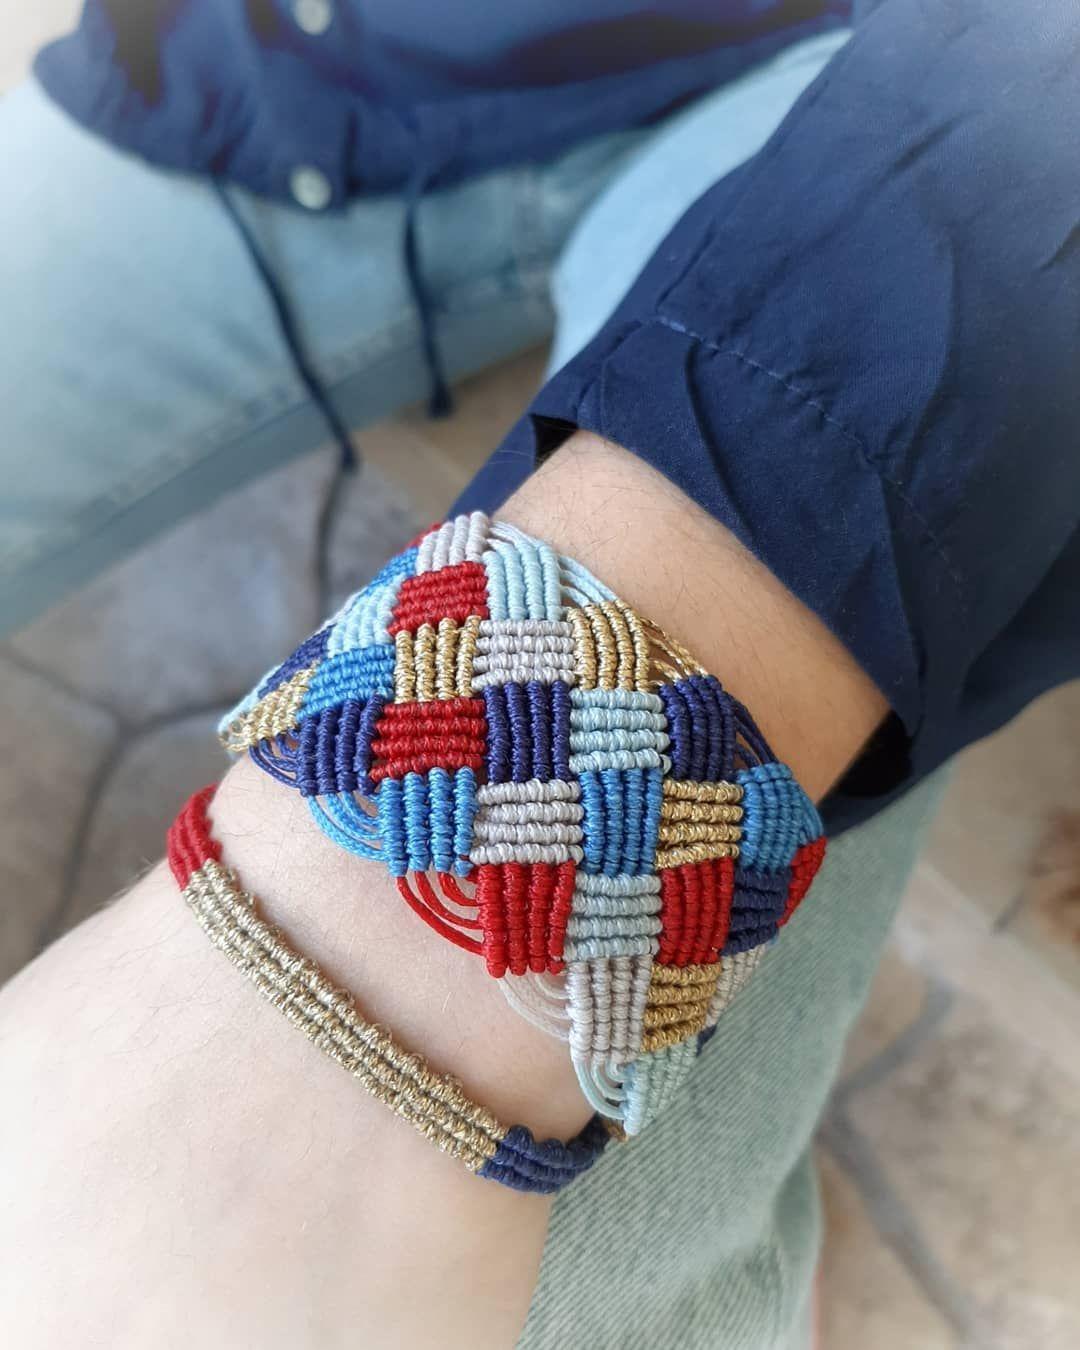 Bracelet#handmade#handcrafted#woman#macrame#waxcord#accessories#cuff#instalove#macrameart#macramelove#blue#bohostyle@sophia_jewlsandmore